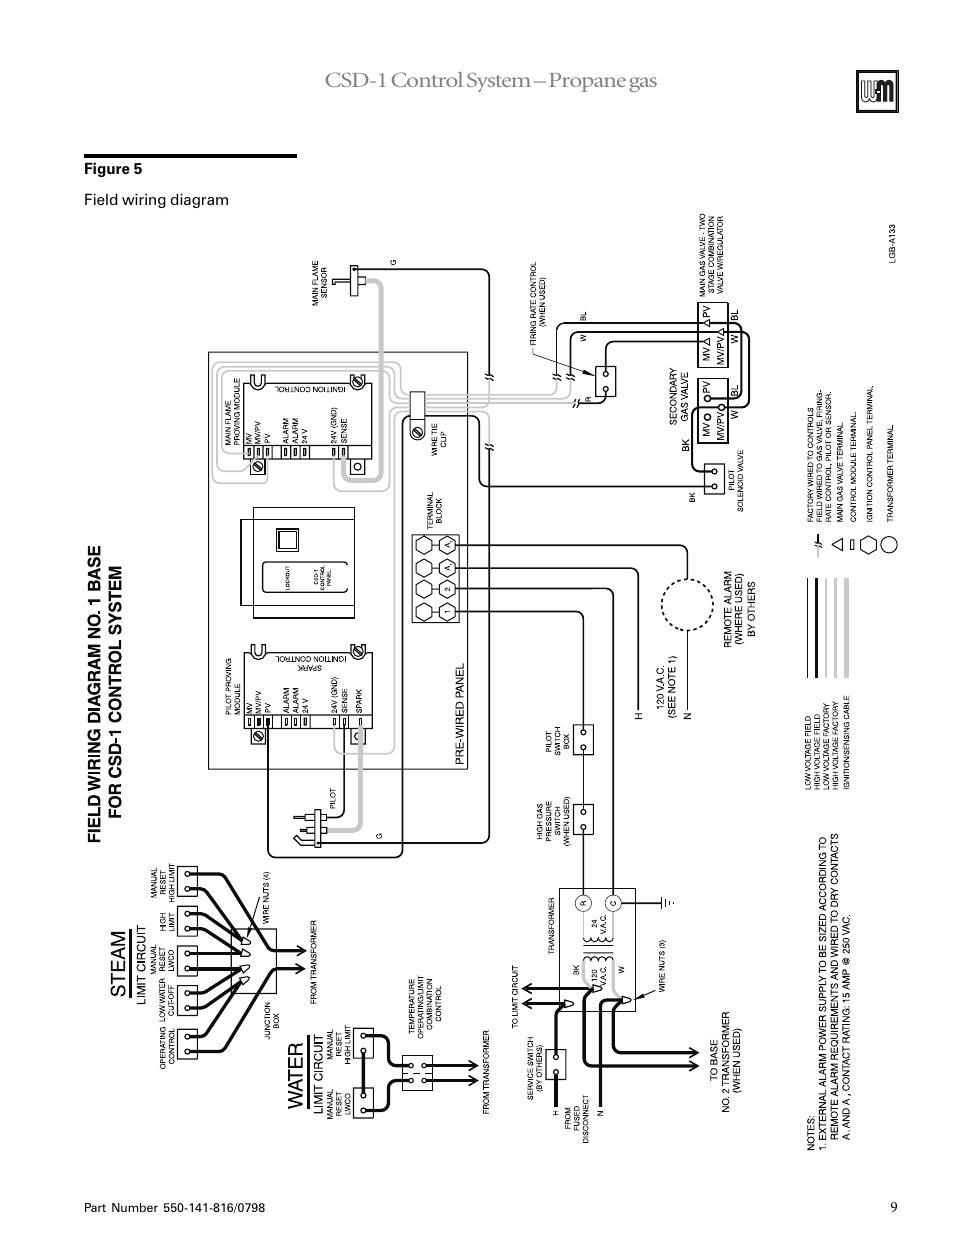 Csd-1 control system